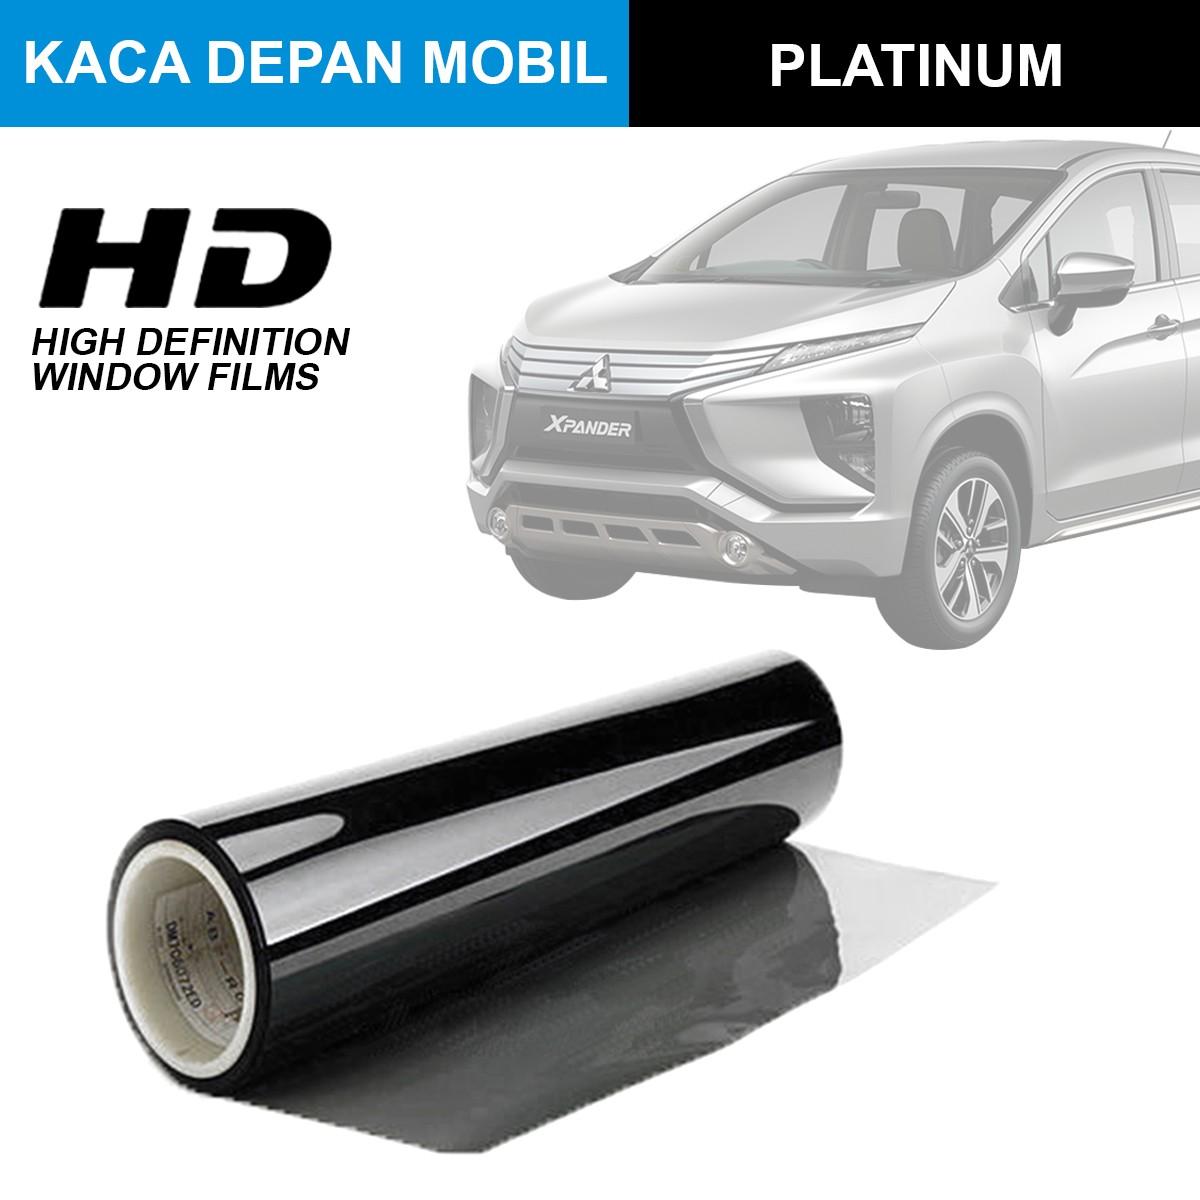 KACA FILM HIGH DEFINITION PLATINUM - (MEDIUM CAR) KACA DEPAN